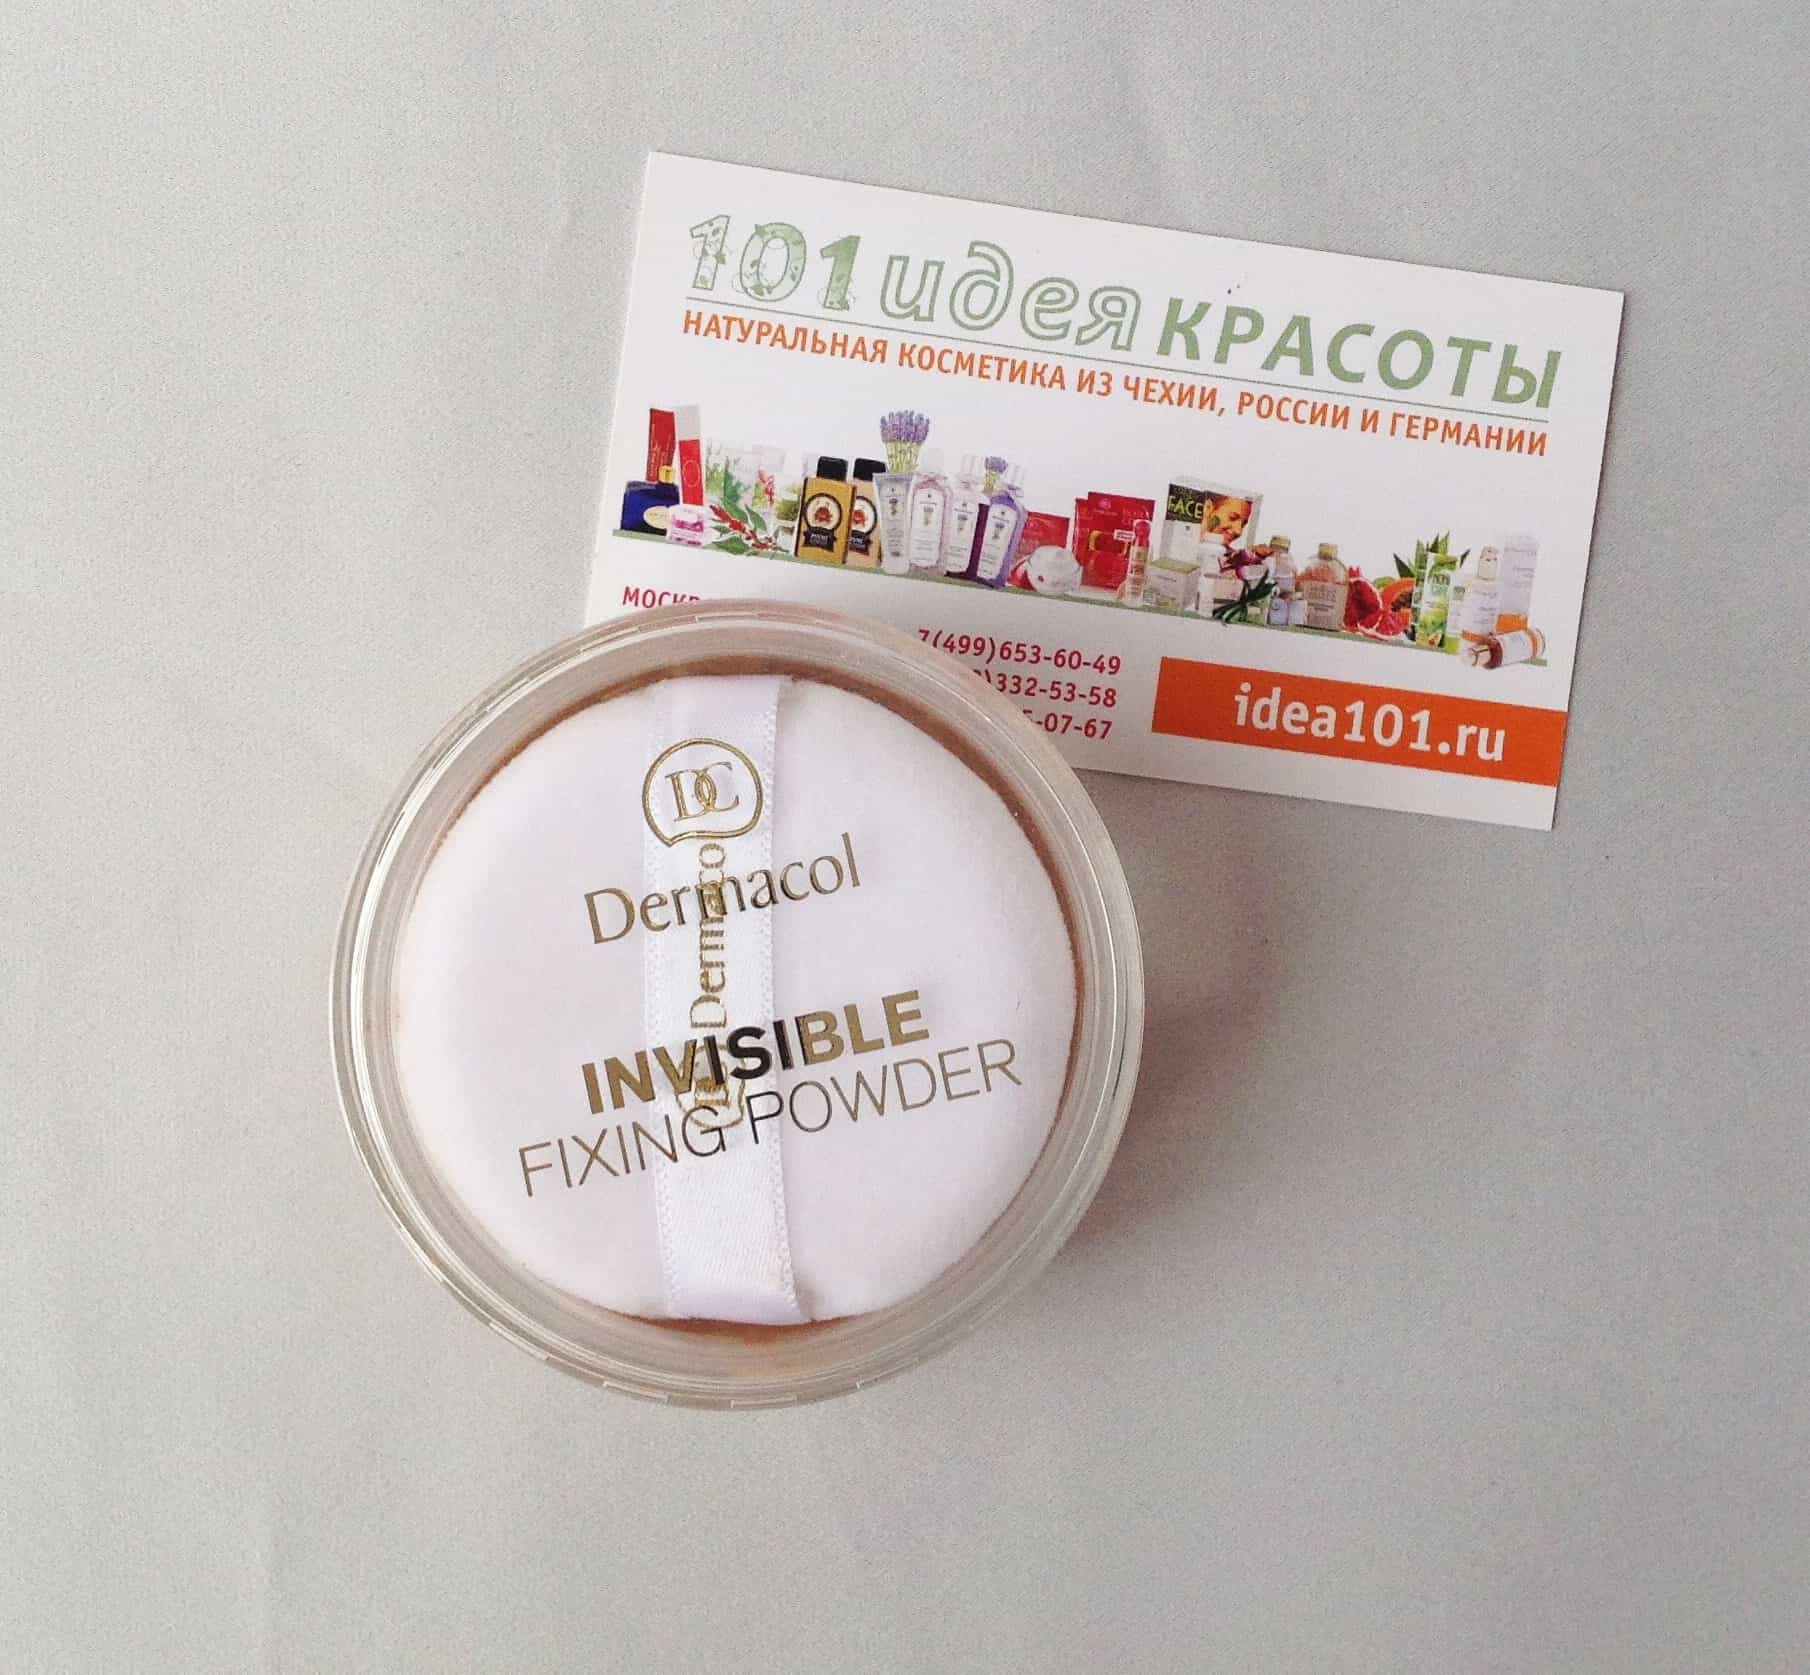 Dermacol Invisible Fixing Powder Прозрачная фиксирующая пудра, 14гр